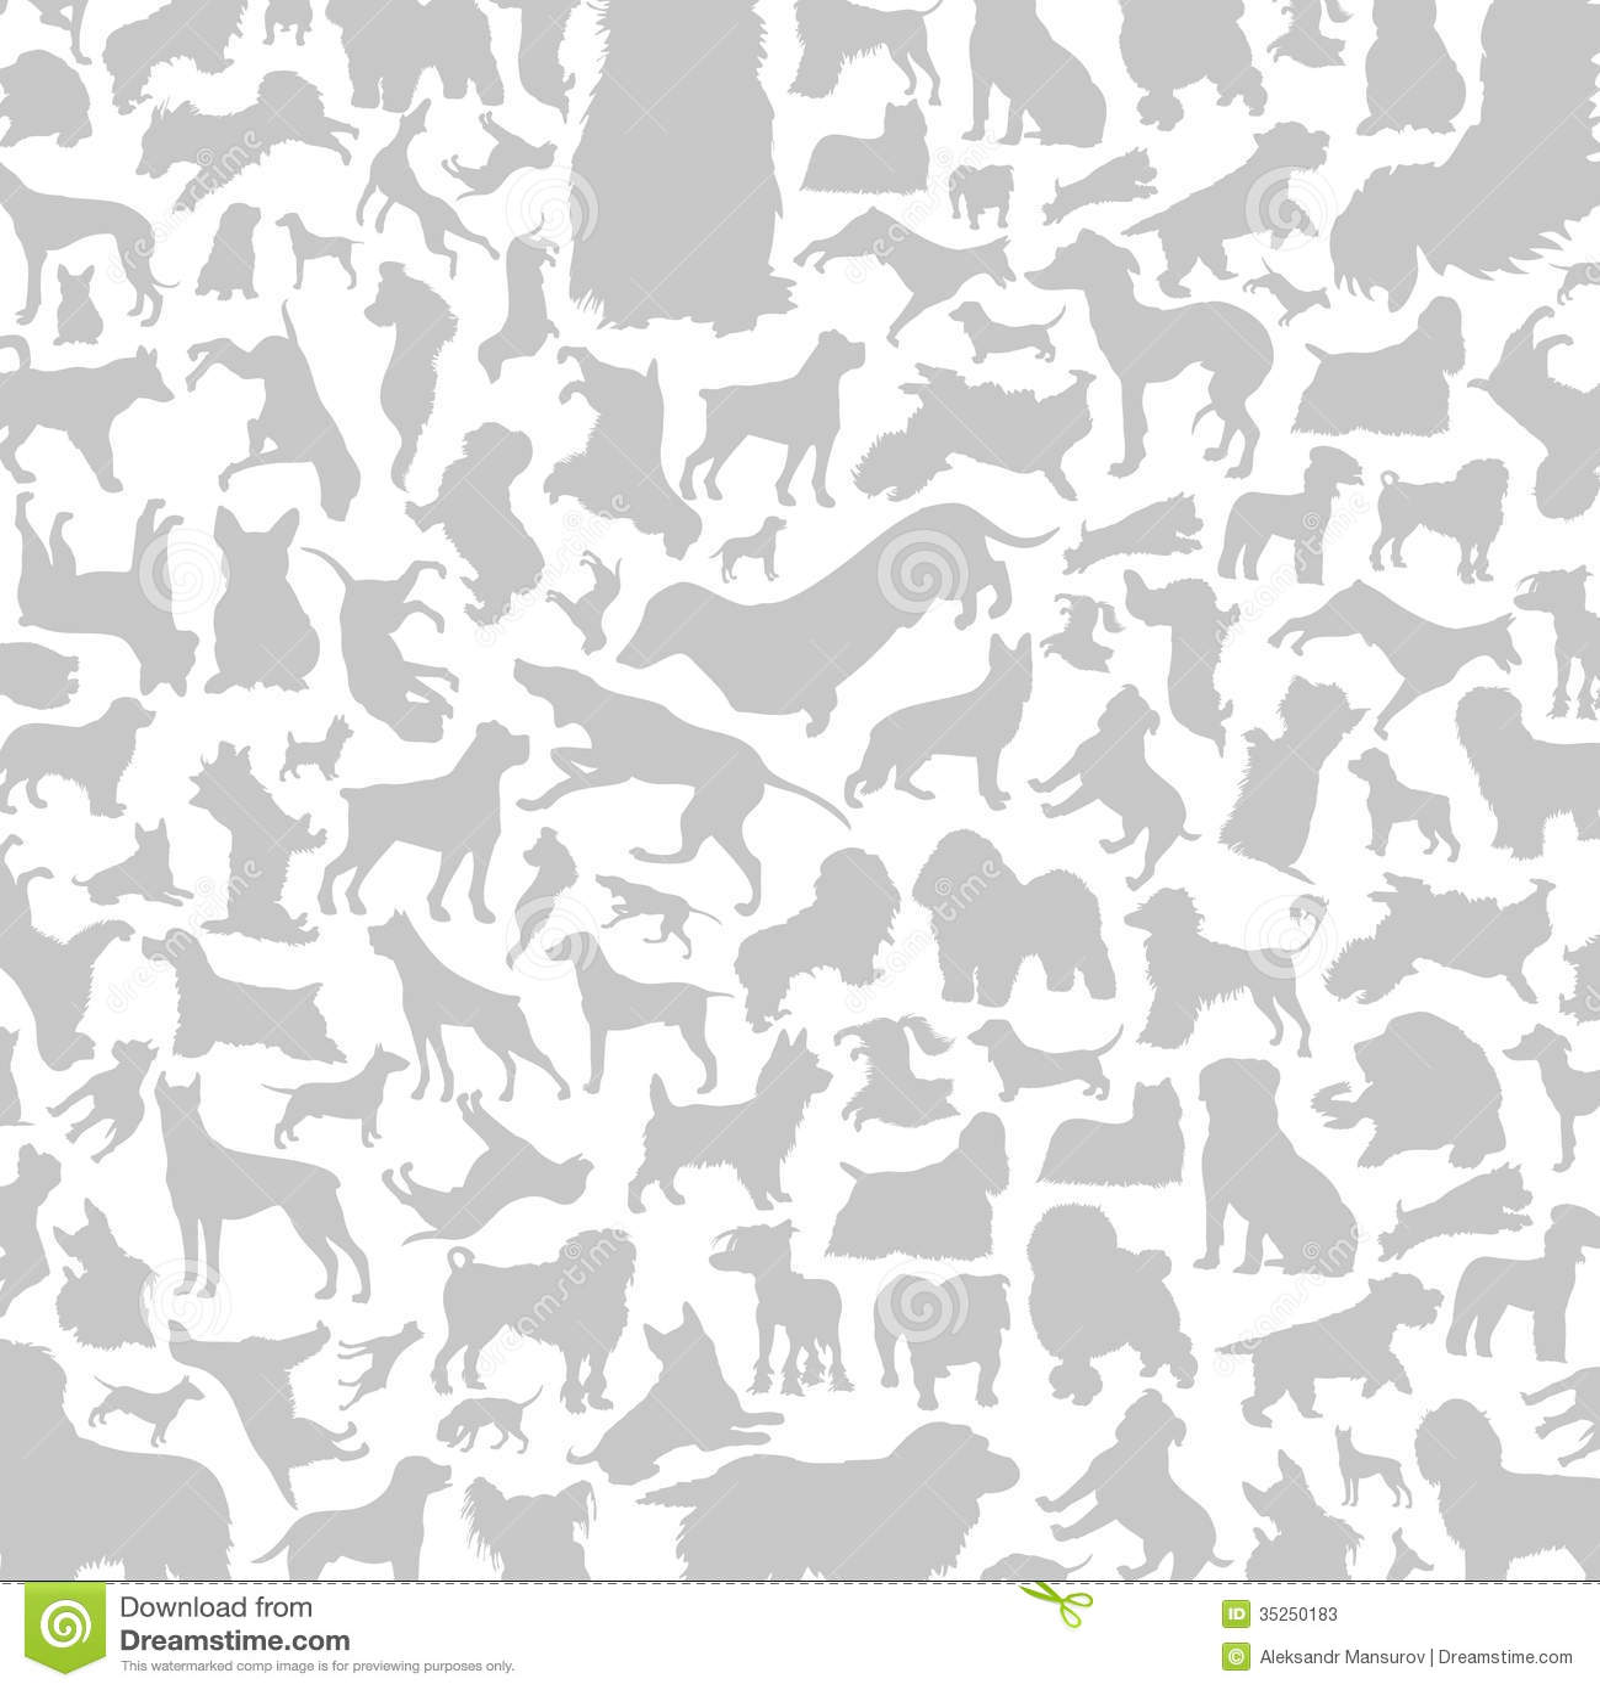 Dog A Background Stock Photos - Image: 35250183